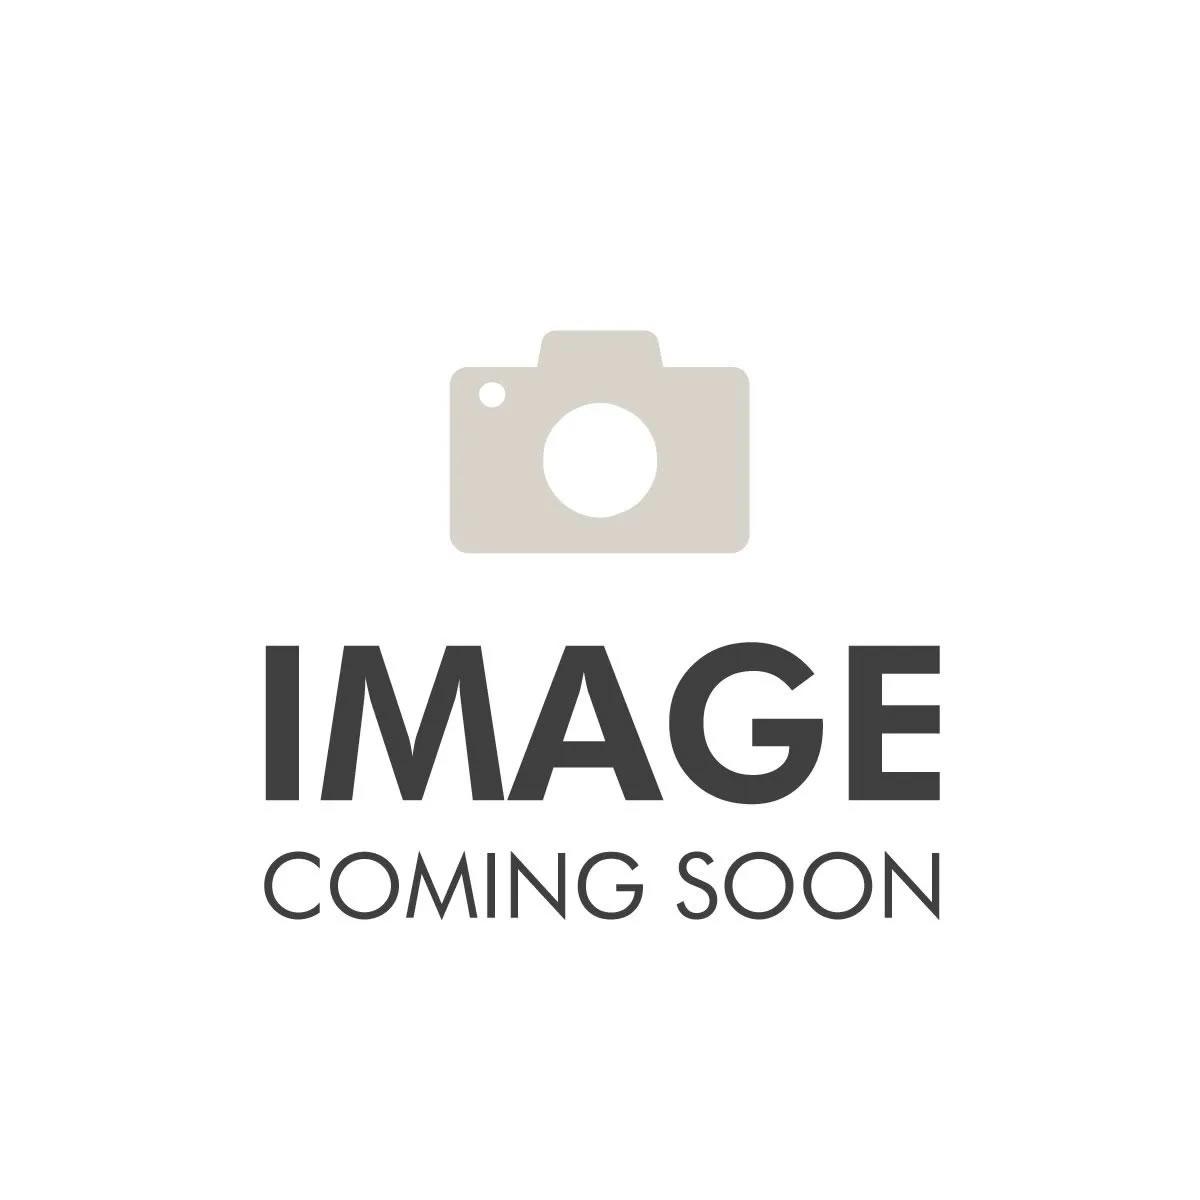 Engine Gasket Set, 134 CI F-Head; 52-71 Jeep CJ